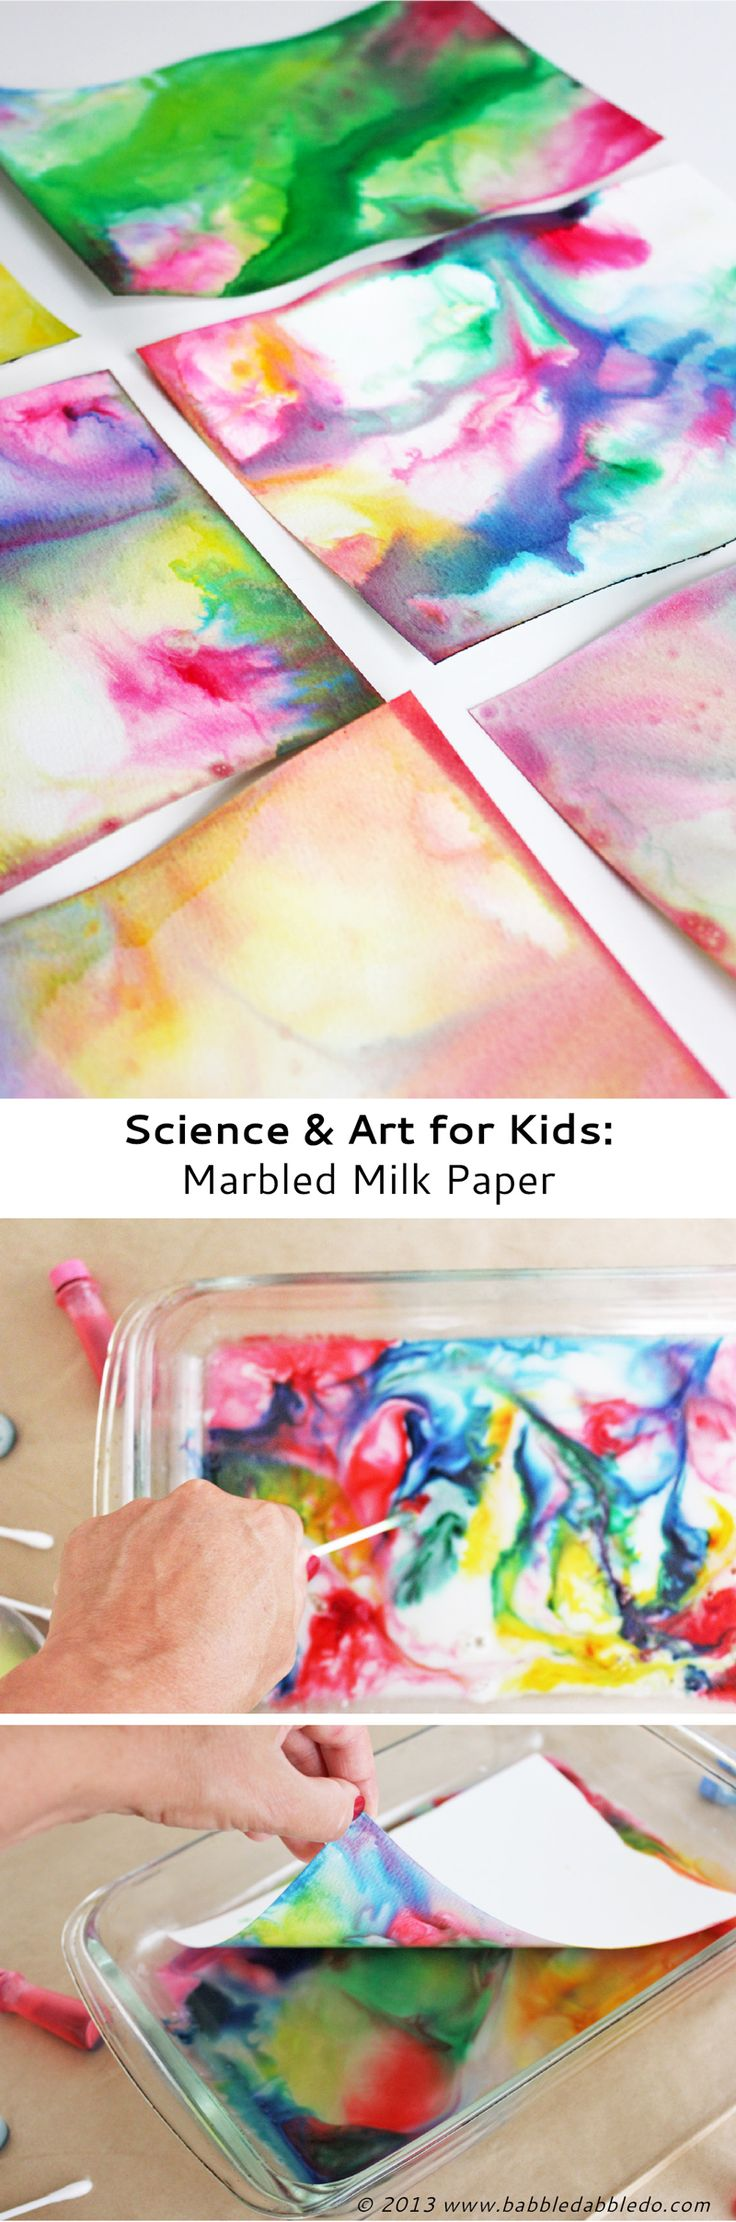 Marble-milk-paper-art